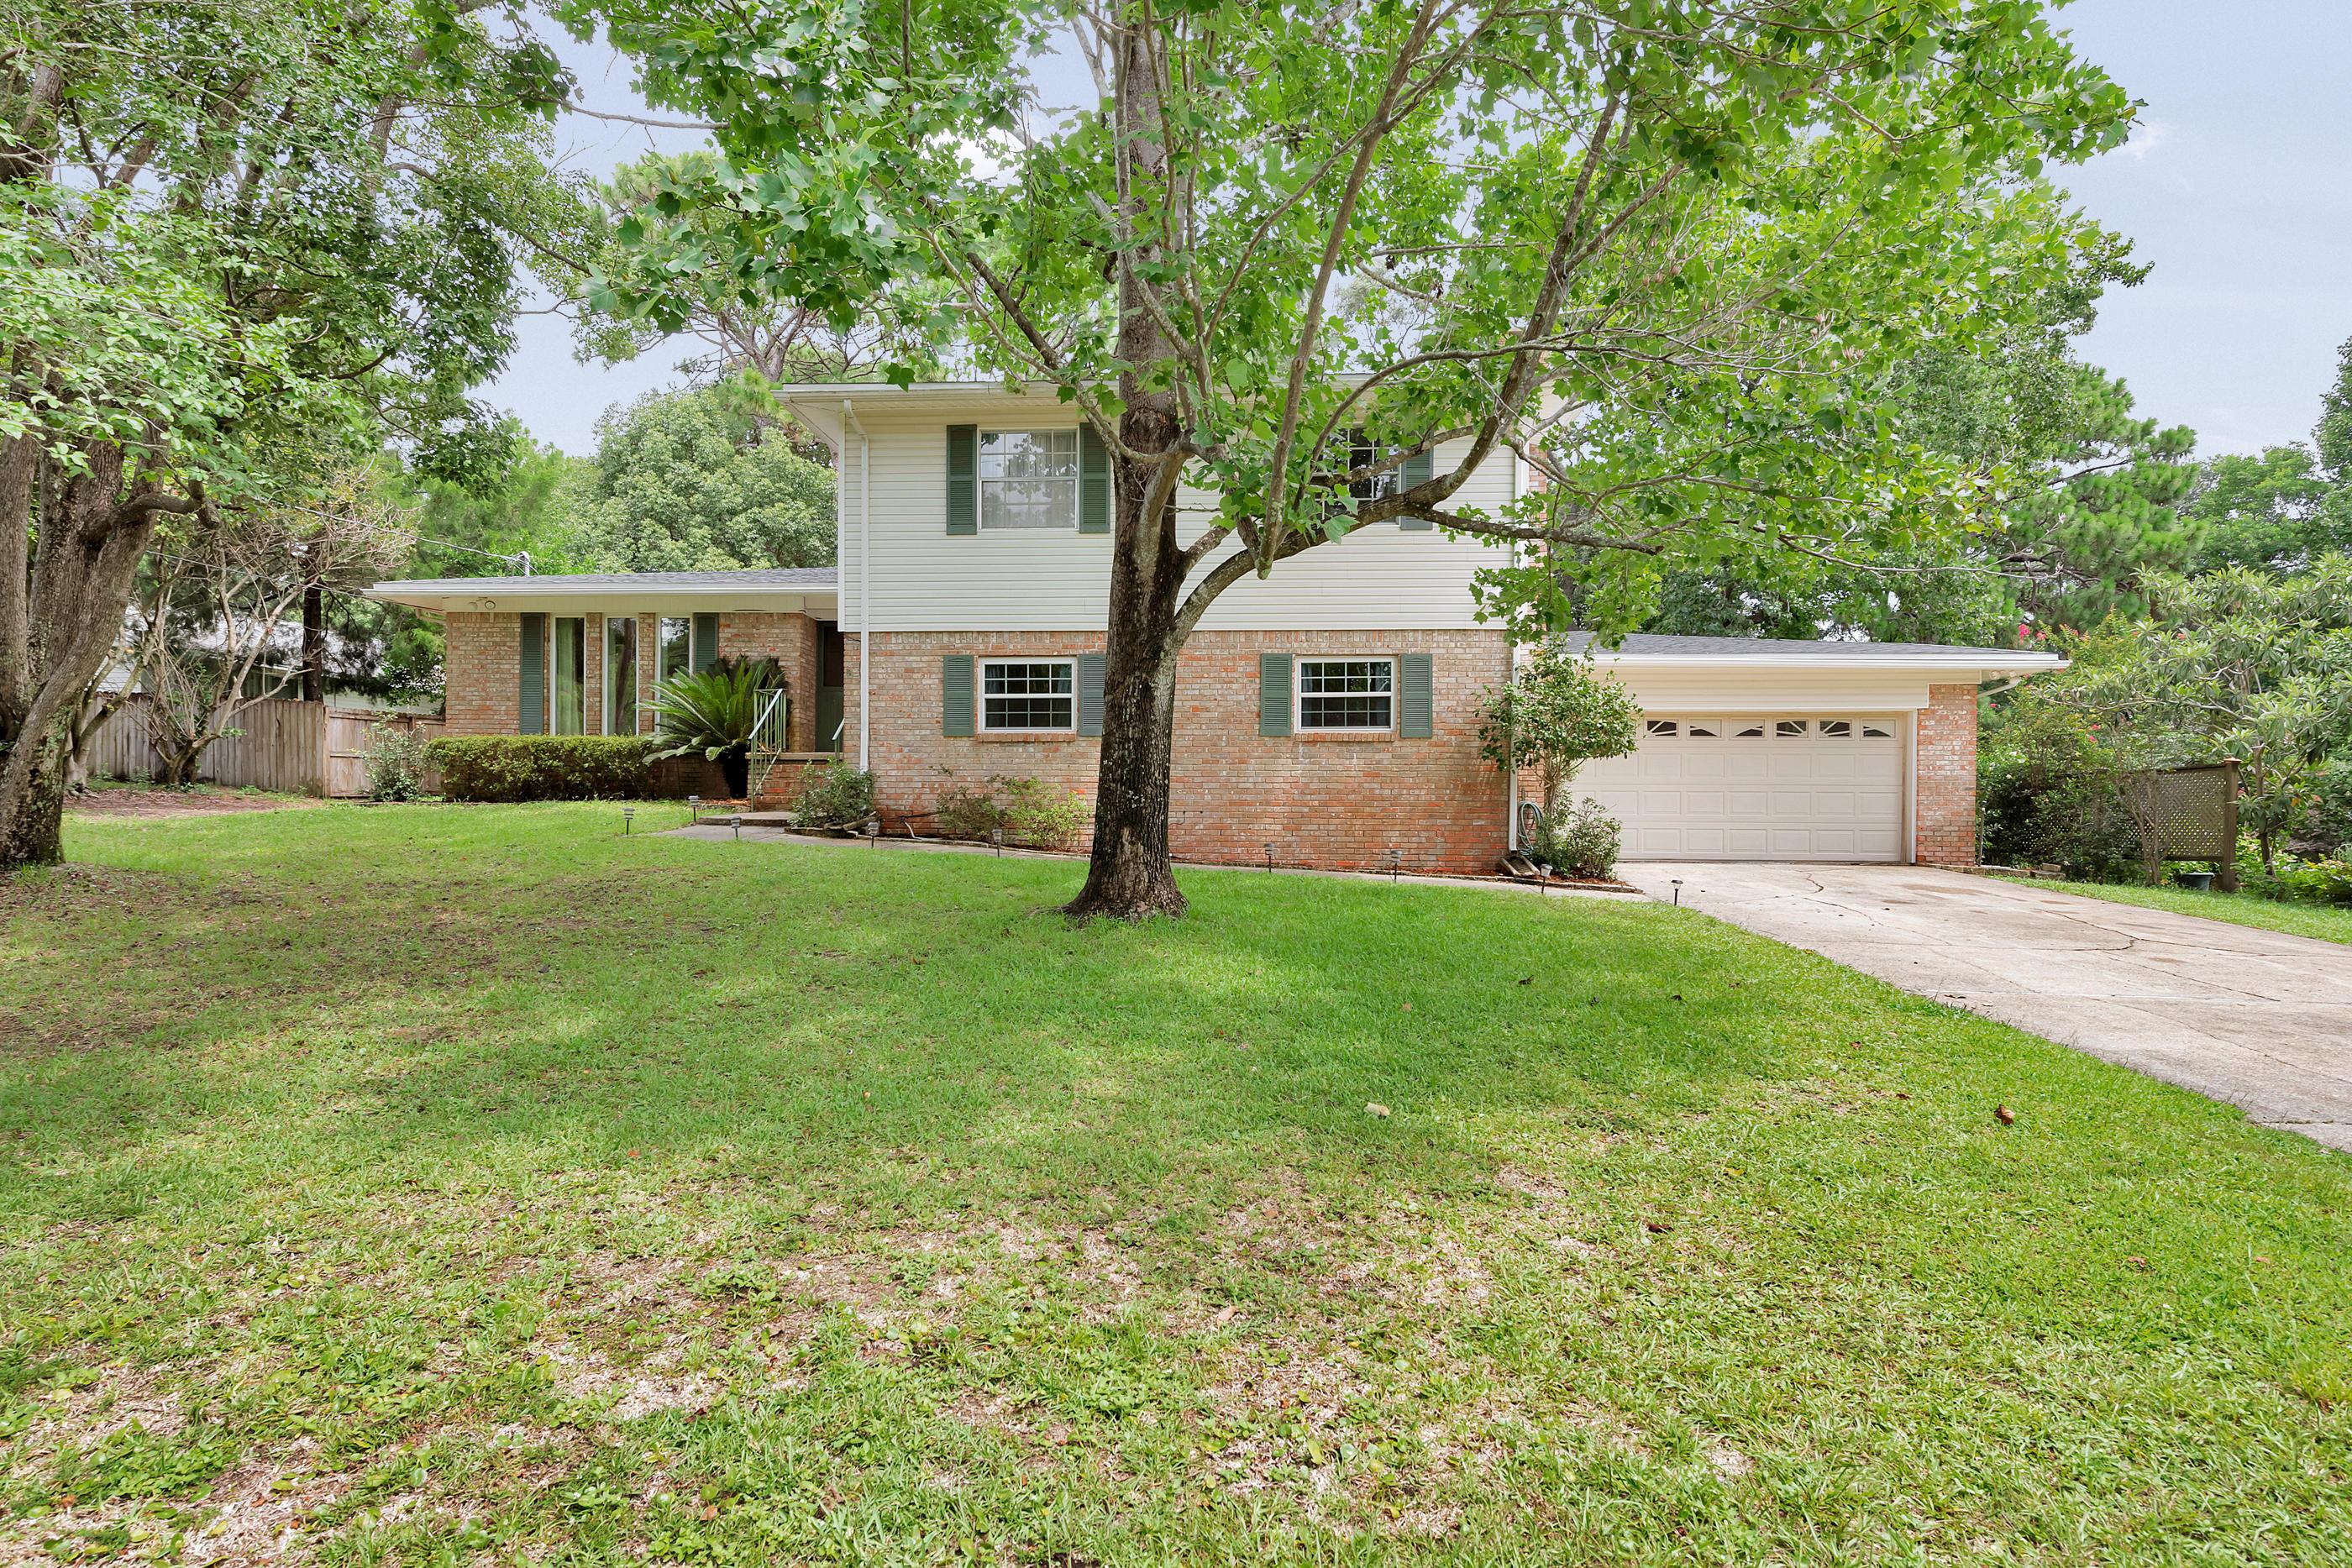 Photo of home for sale at 39 Walnut, Shalimar FL